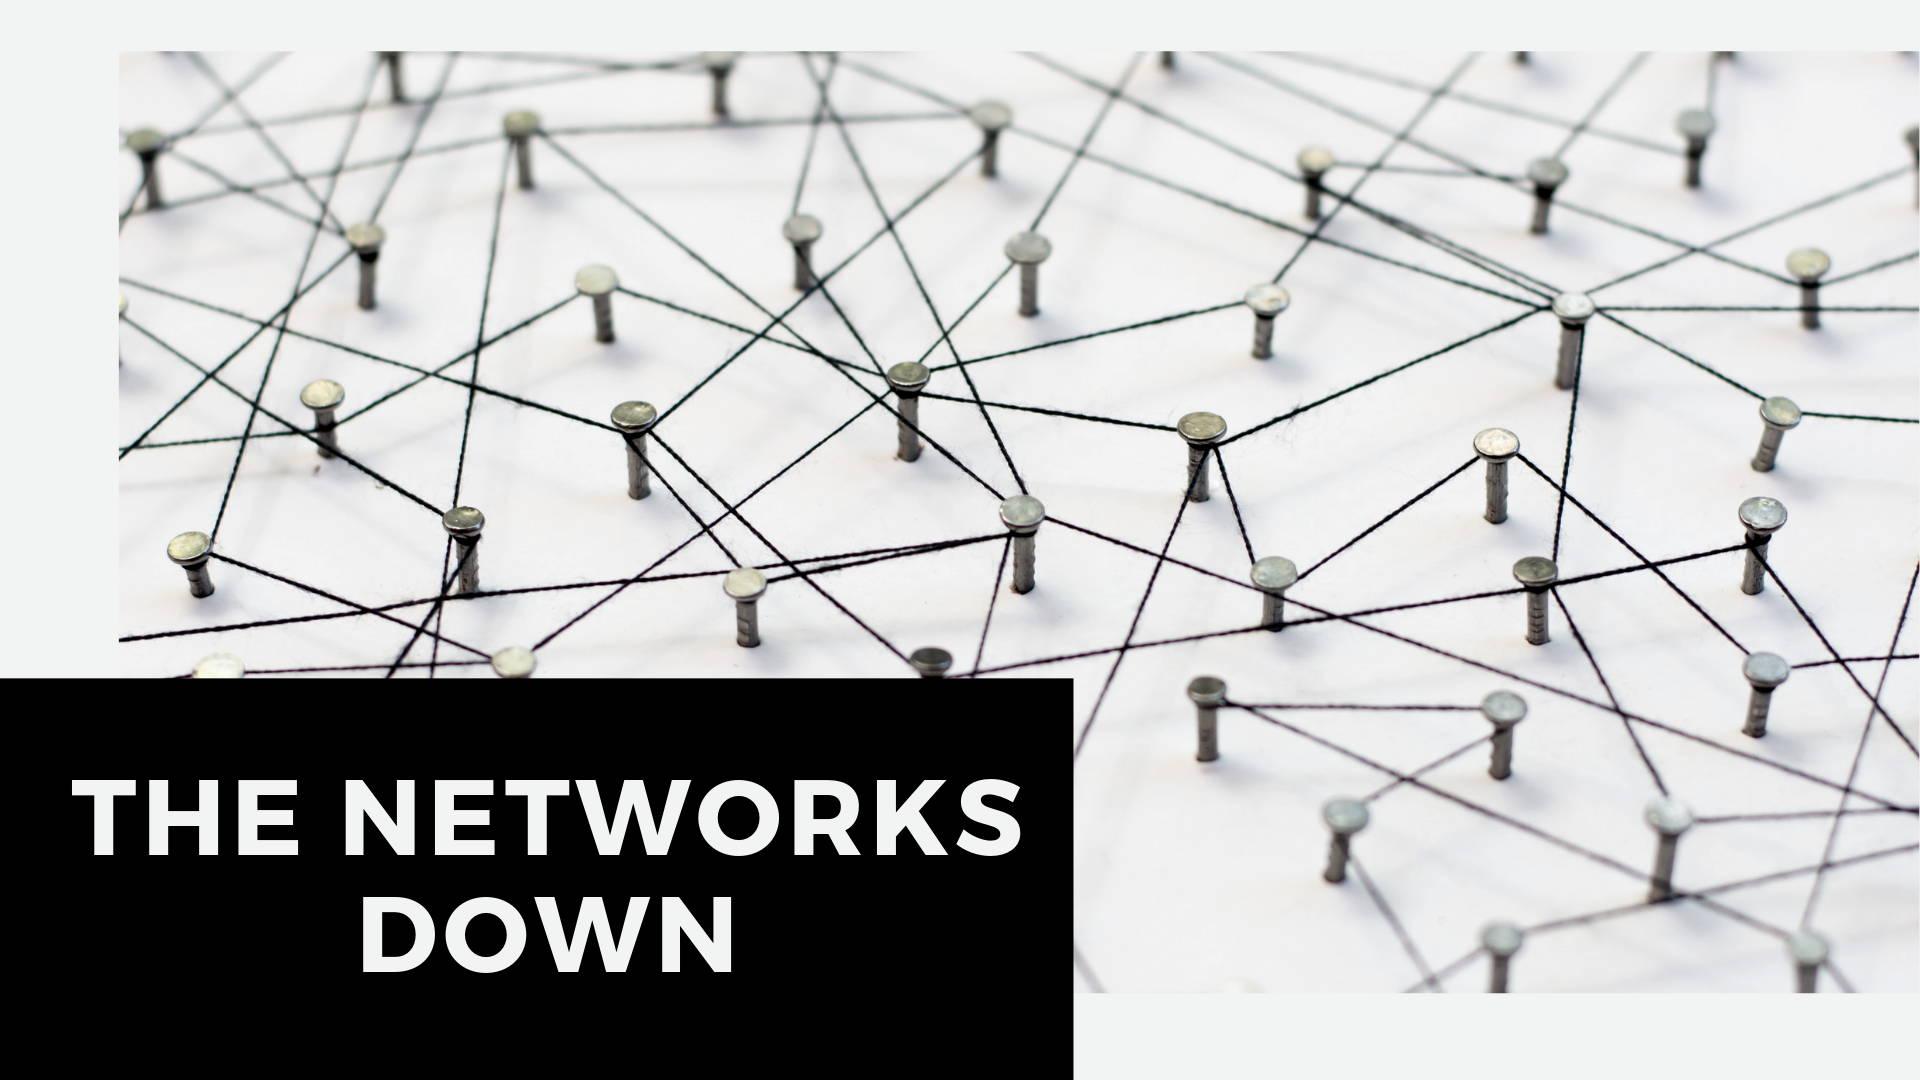 Instagram, Facebook and WhatsApp systems interruption